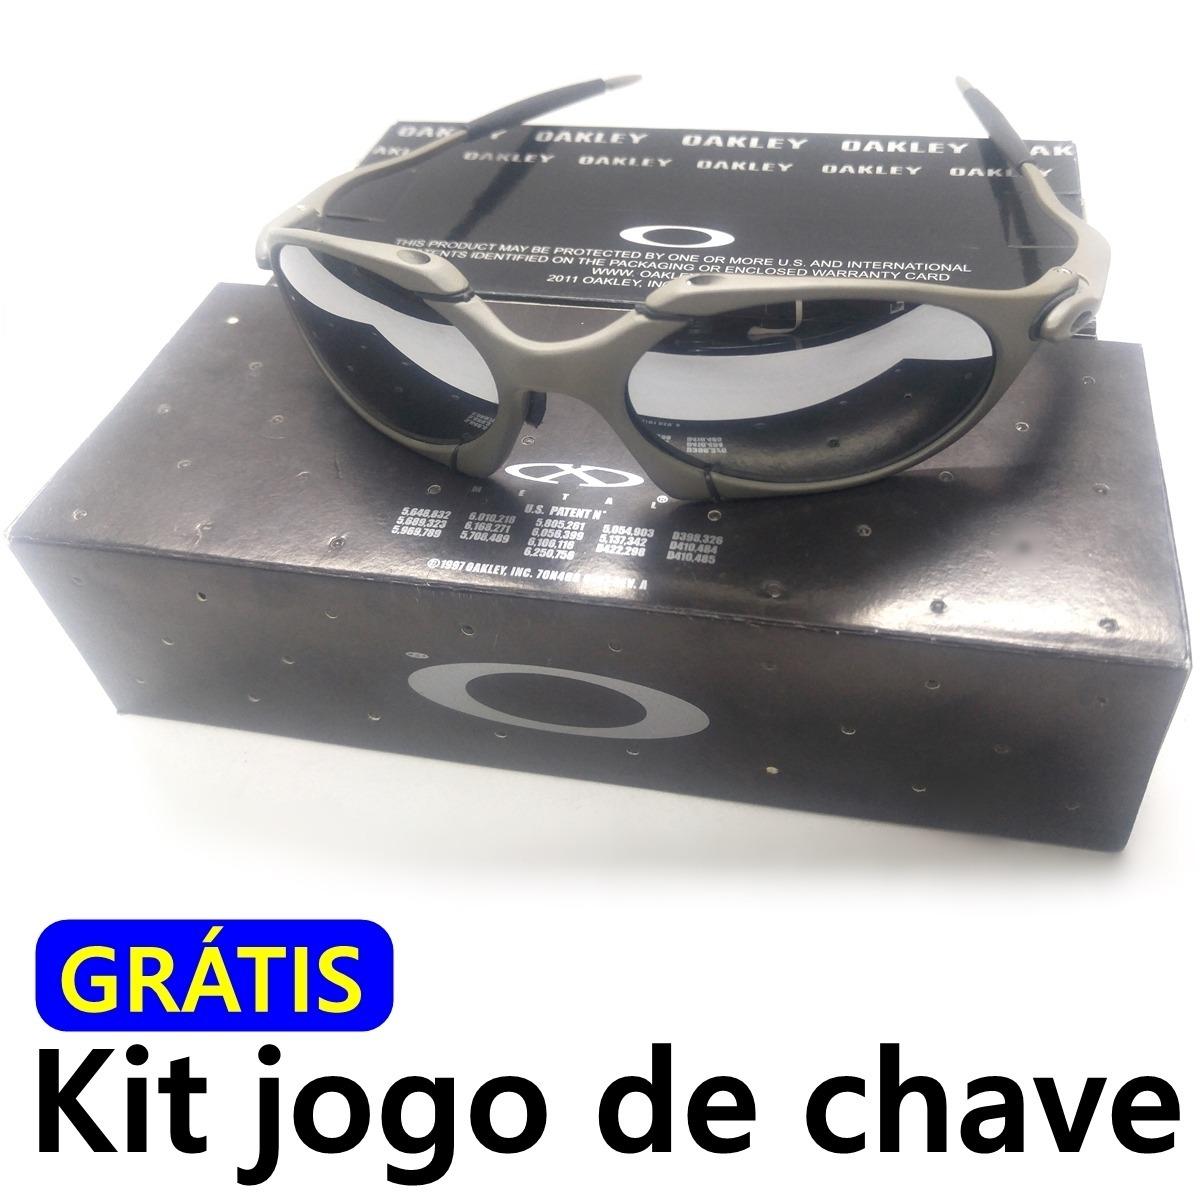 e8c1360a9 Óculos Oakley Romeo 1 2 Liquid Metal Só R$ 89,99 - R$ 89,99 em ...